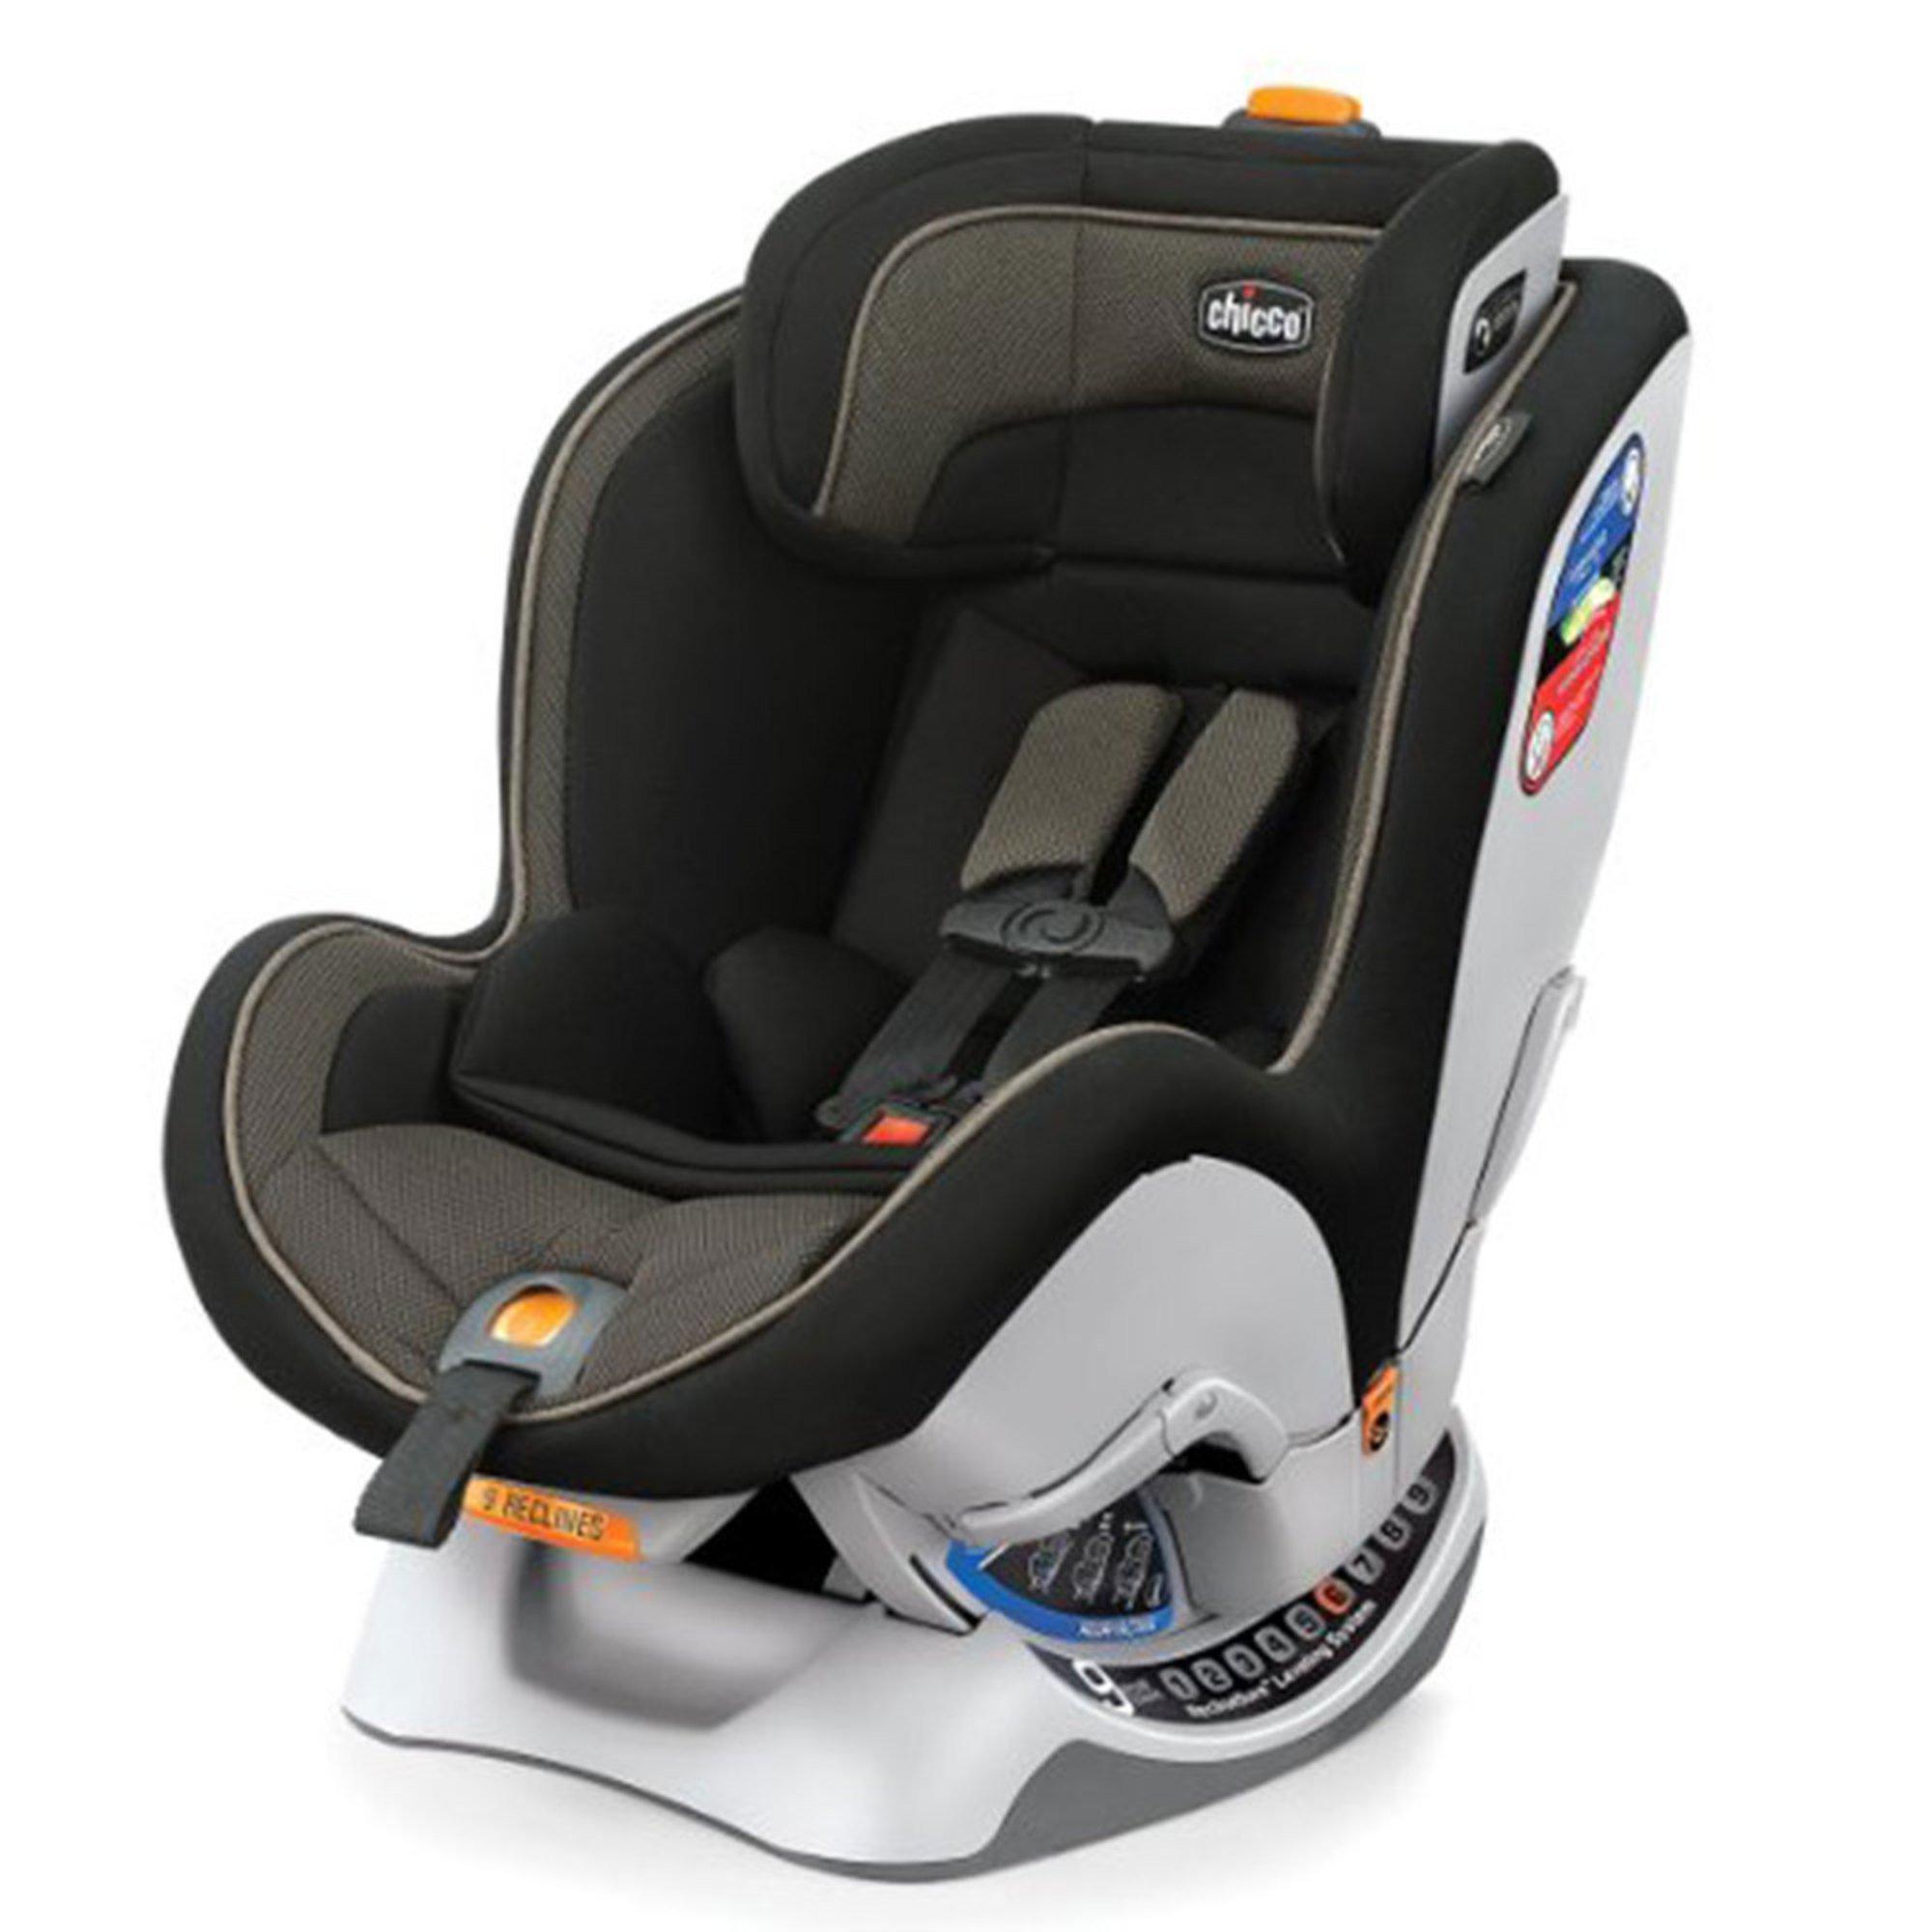 Fetching Co Nextfit Convertible Car Matrix Car Seats Shop Your Navy Exchange Official Site Graco Slimfit Camelot Graco Slim Fit Babies R Us baby Graco Slim Fit